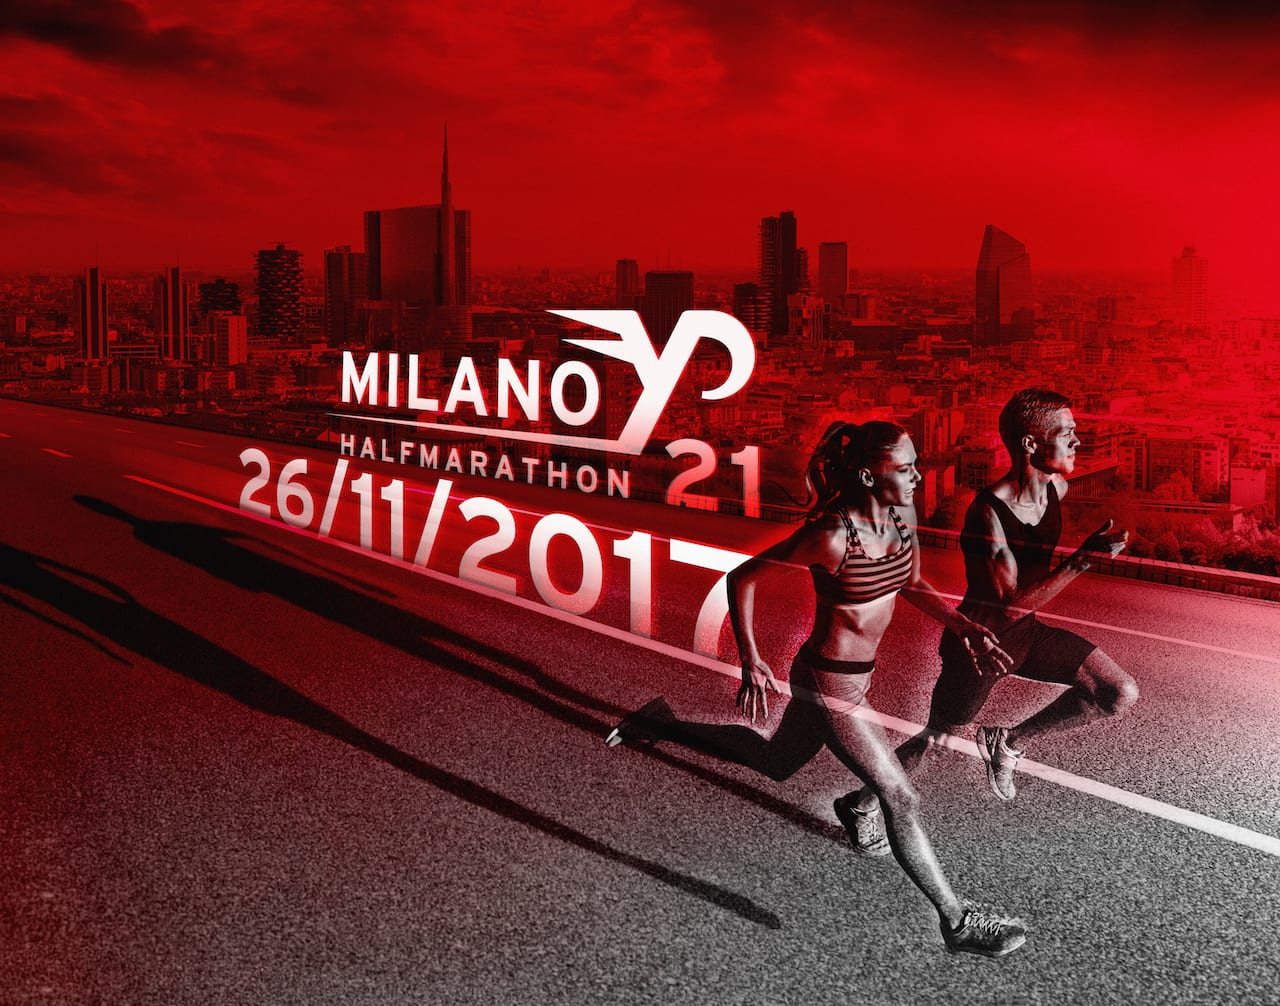 Milano21 Half Marathon.